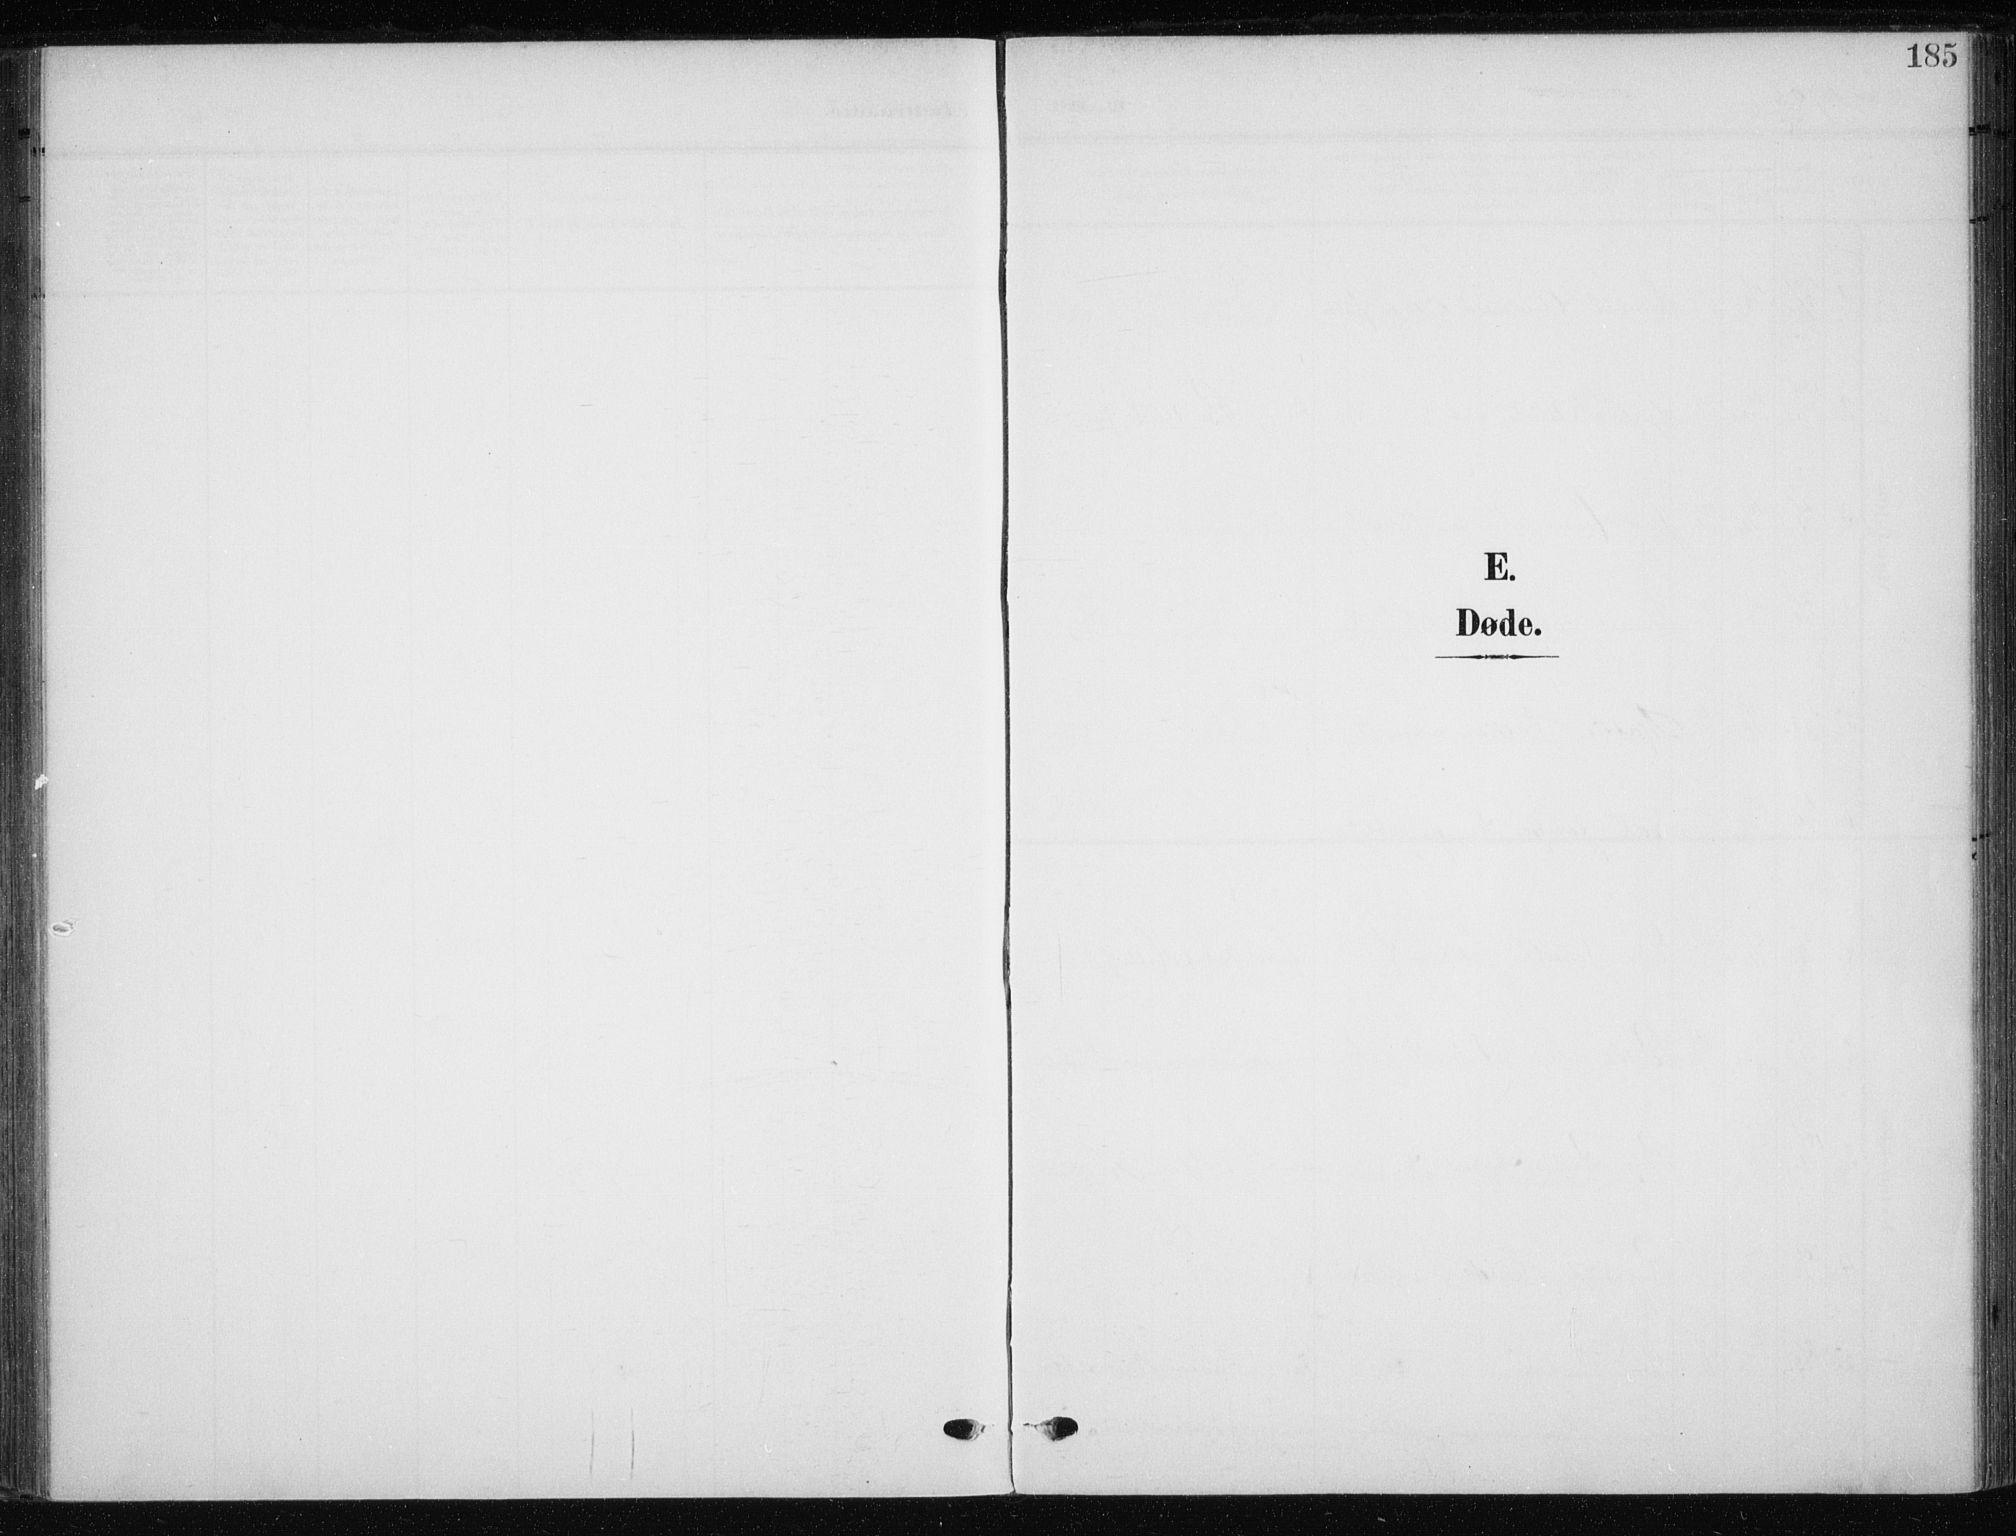 SATØ, Kistrand/Porsanger sokneprestembete, H/Ha/L0014.kirke: Ministerialbok nr. 14, 1908-1917, s. 185